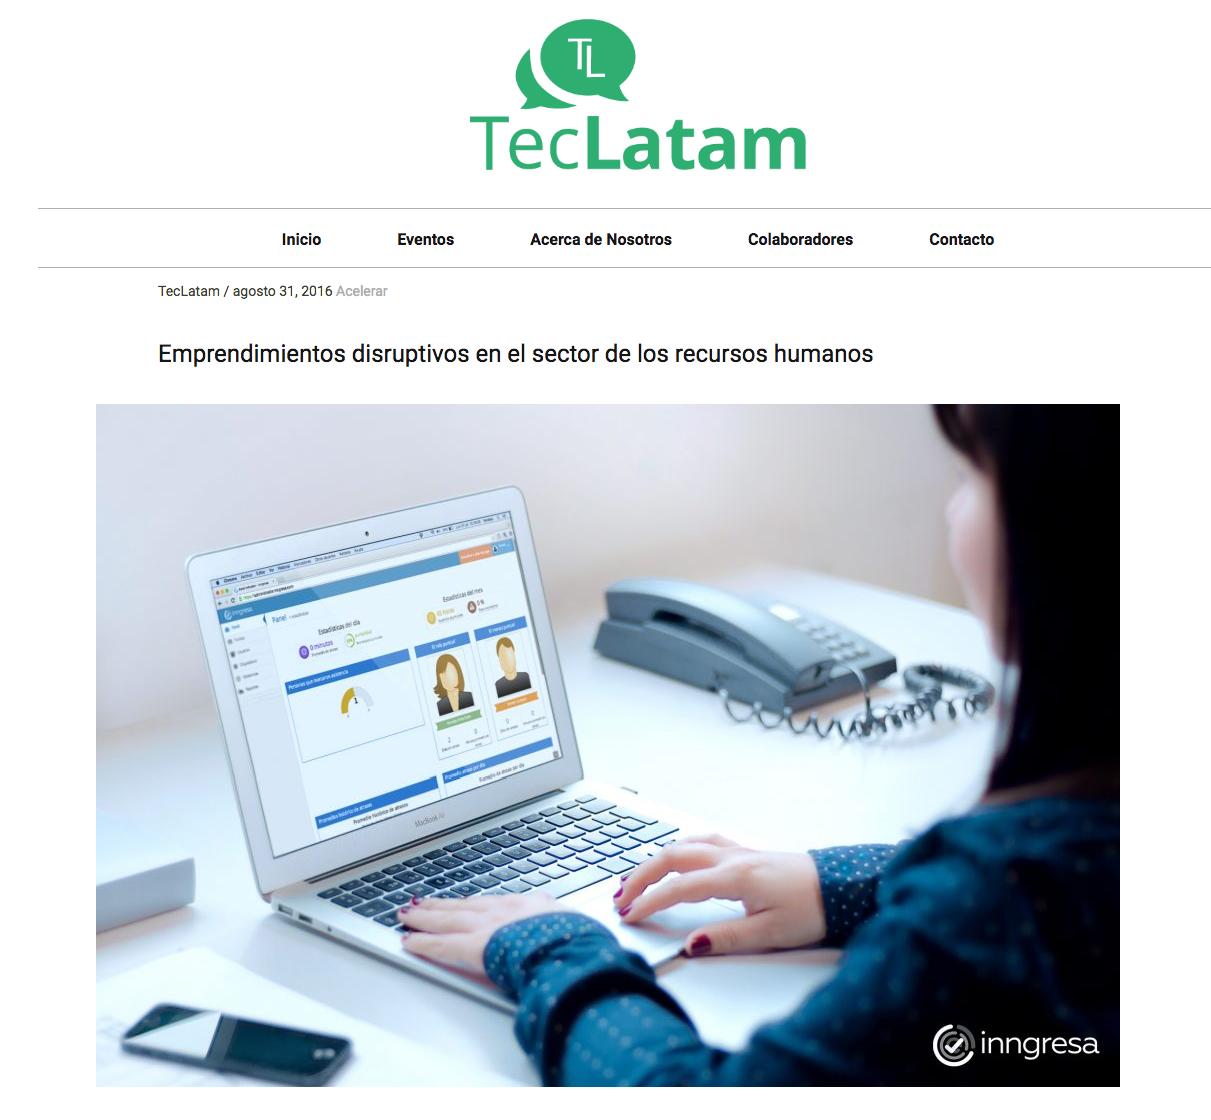 Entrevista_TecLatam Inngresa